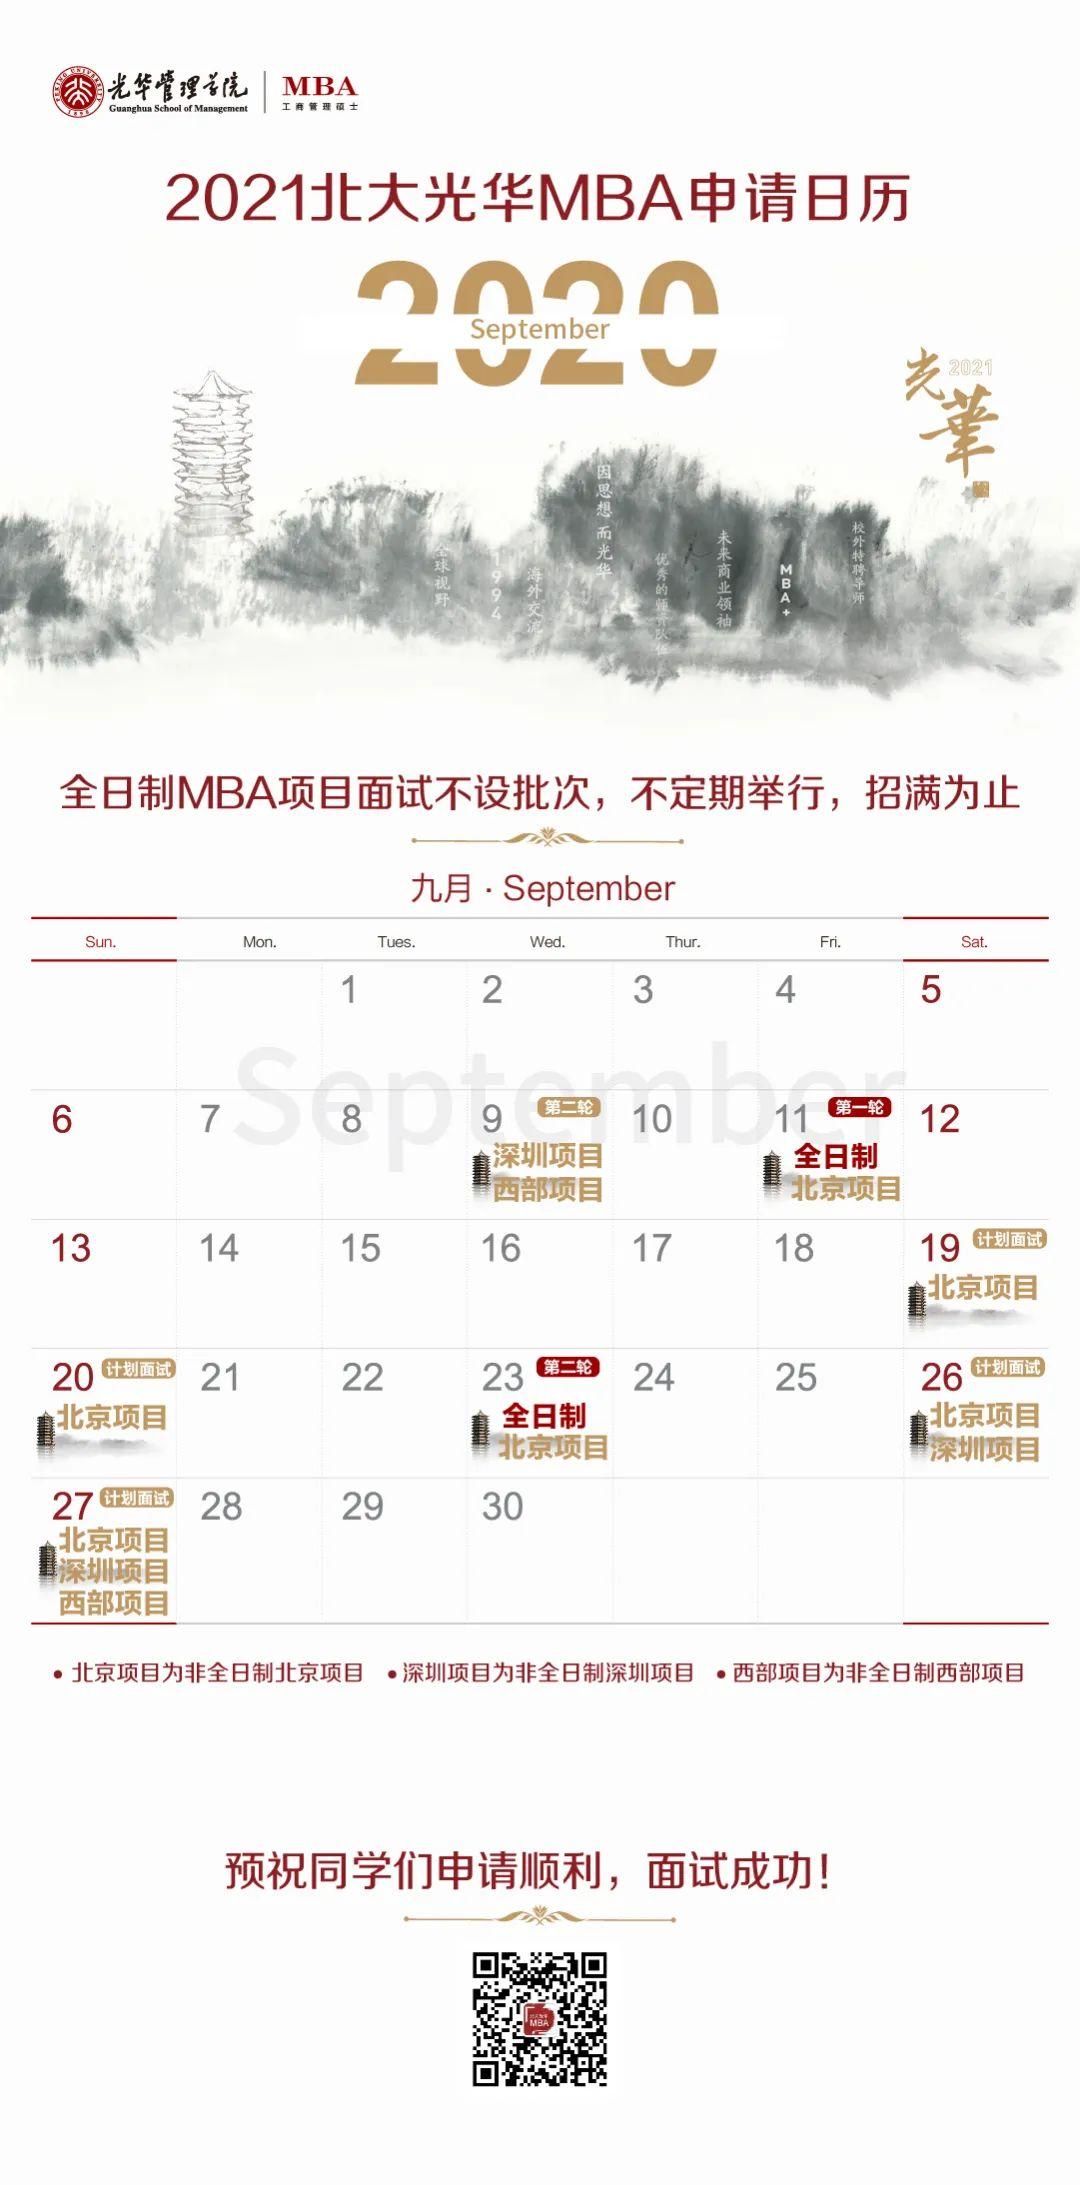 2021MBA院校咨讯: 北大光华MBA全日制,北京项目申请提交即将截止!